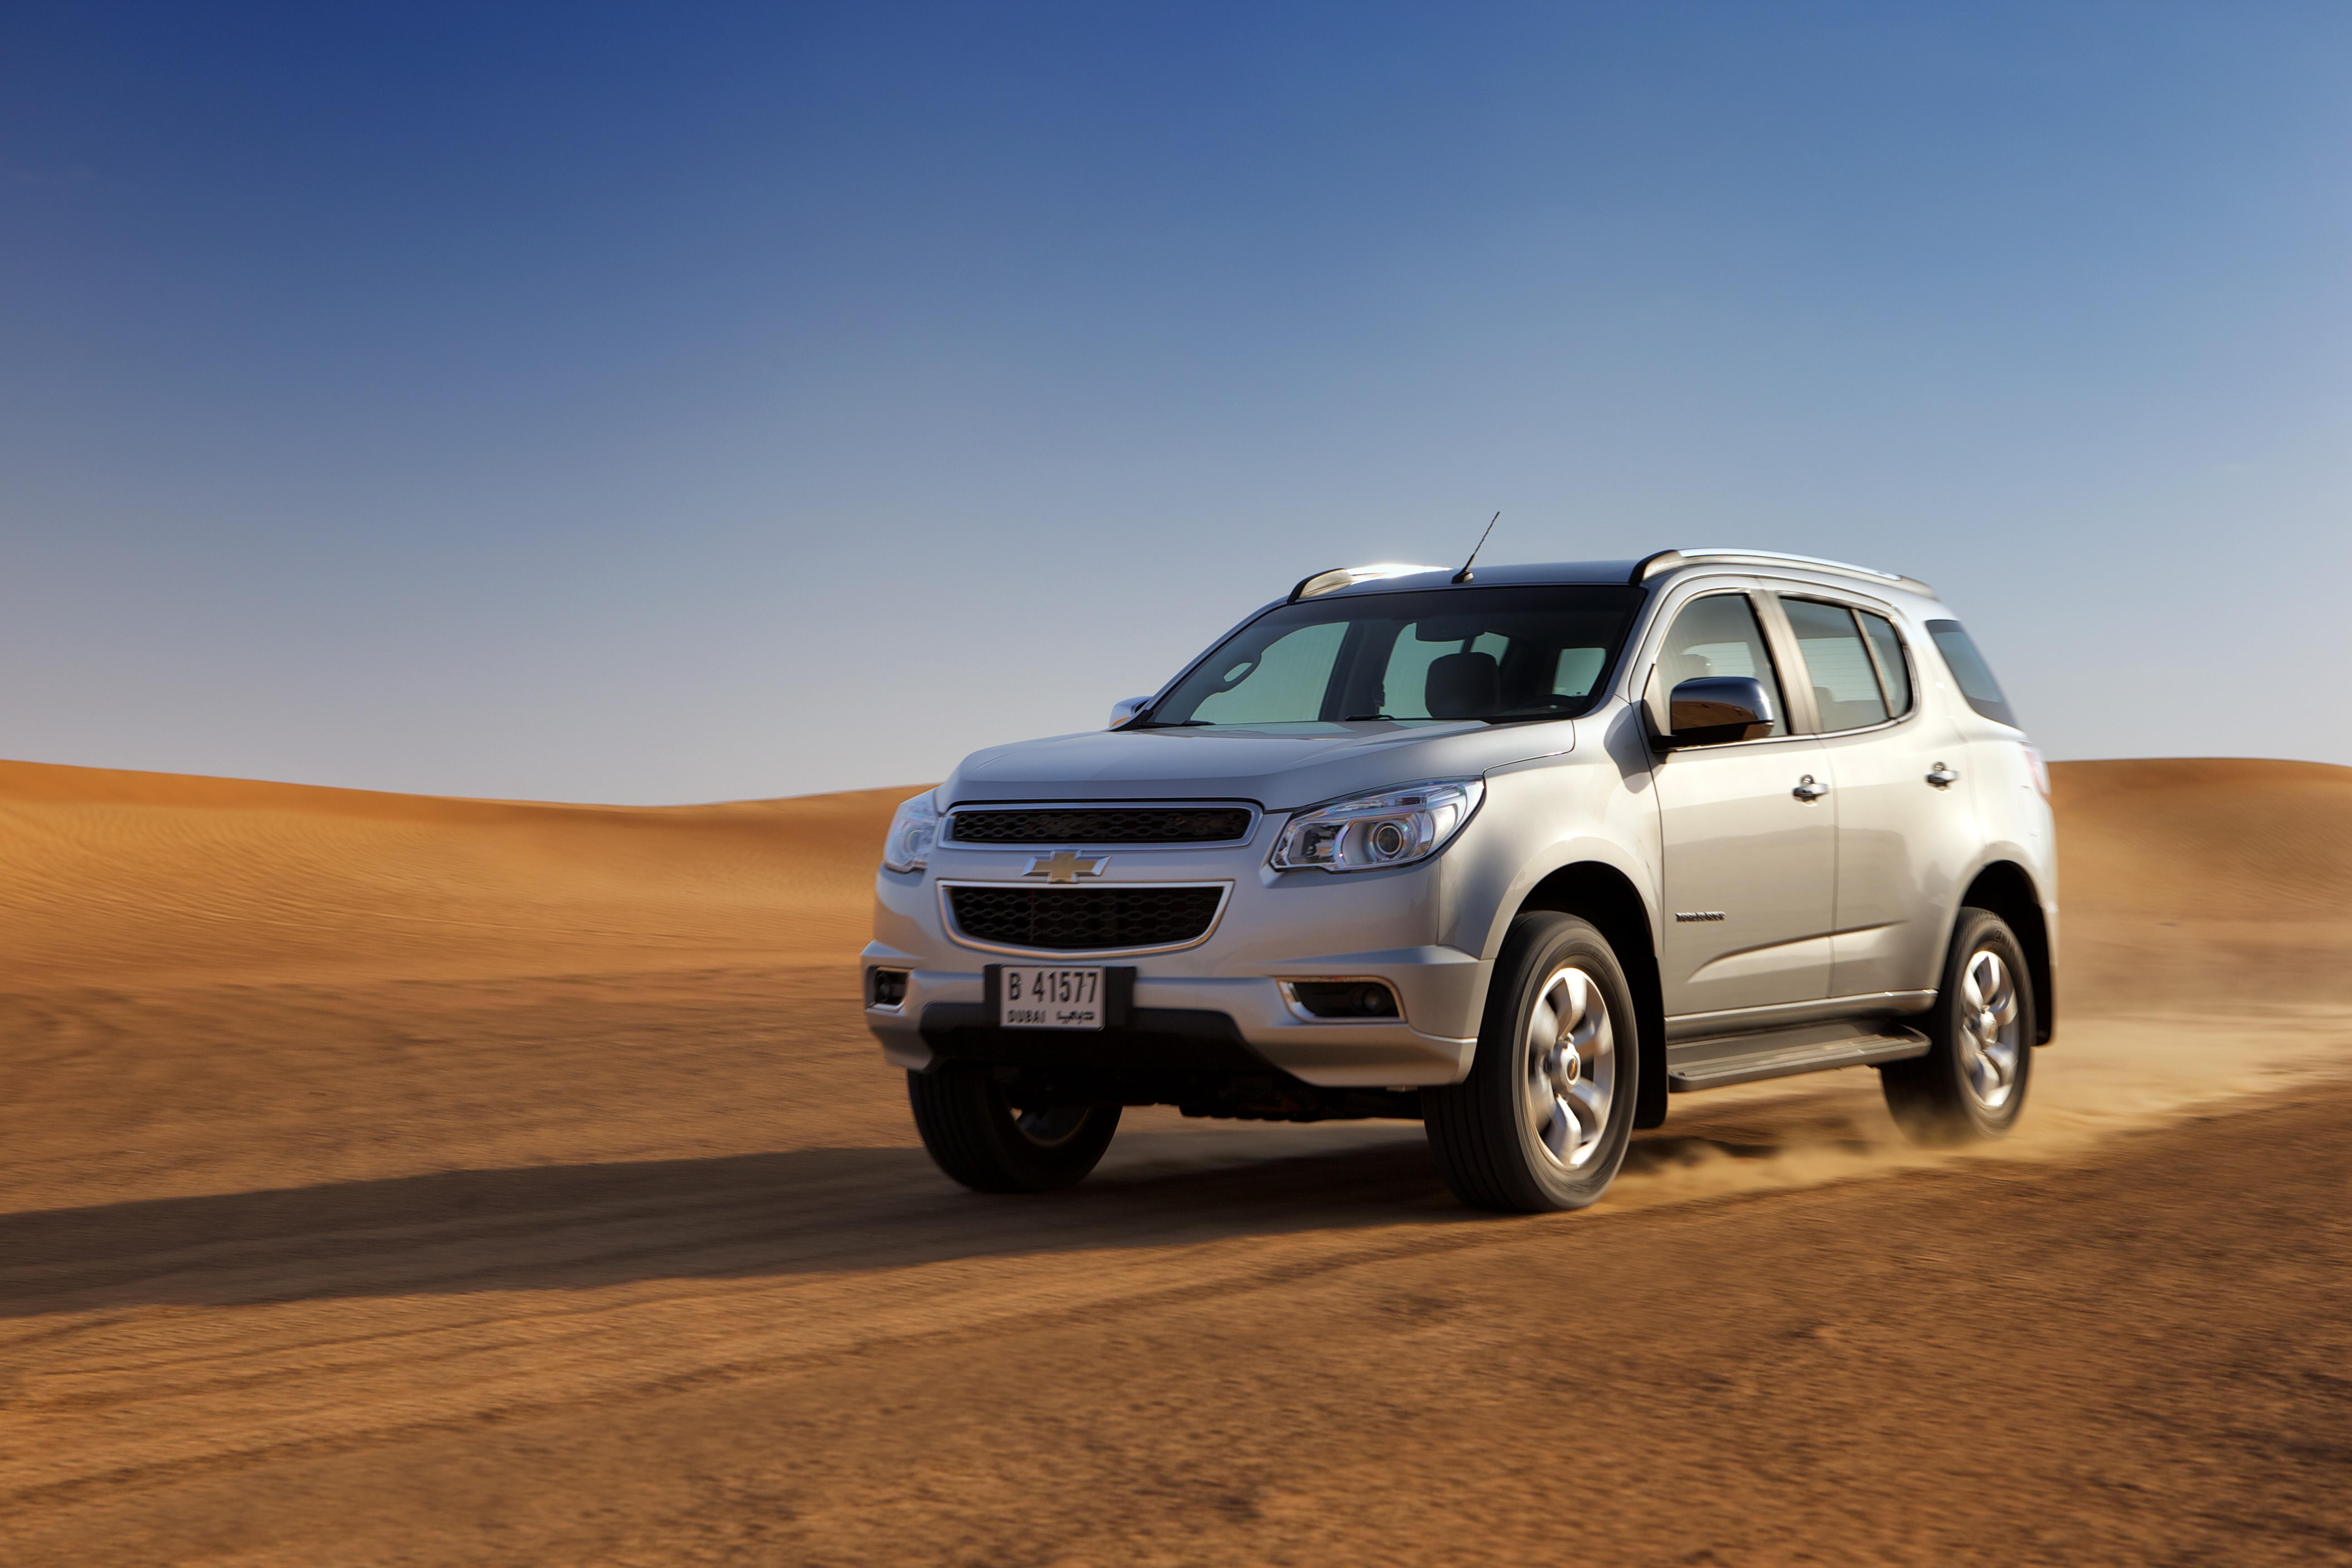 Chevrolet Trailblazer 2015 >> Chevrolet Pressroom Middle East 2014 Trailblazer